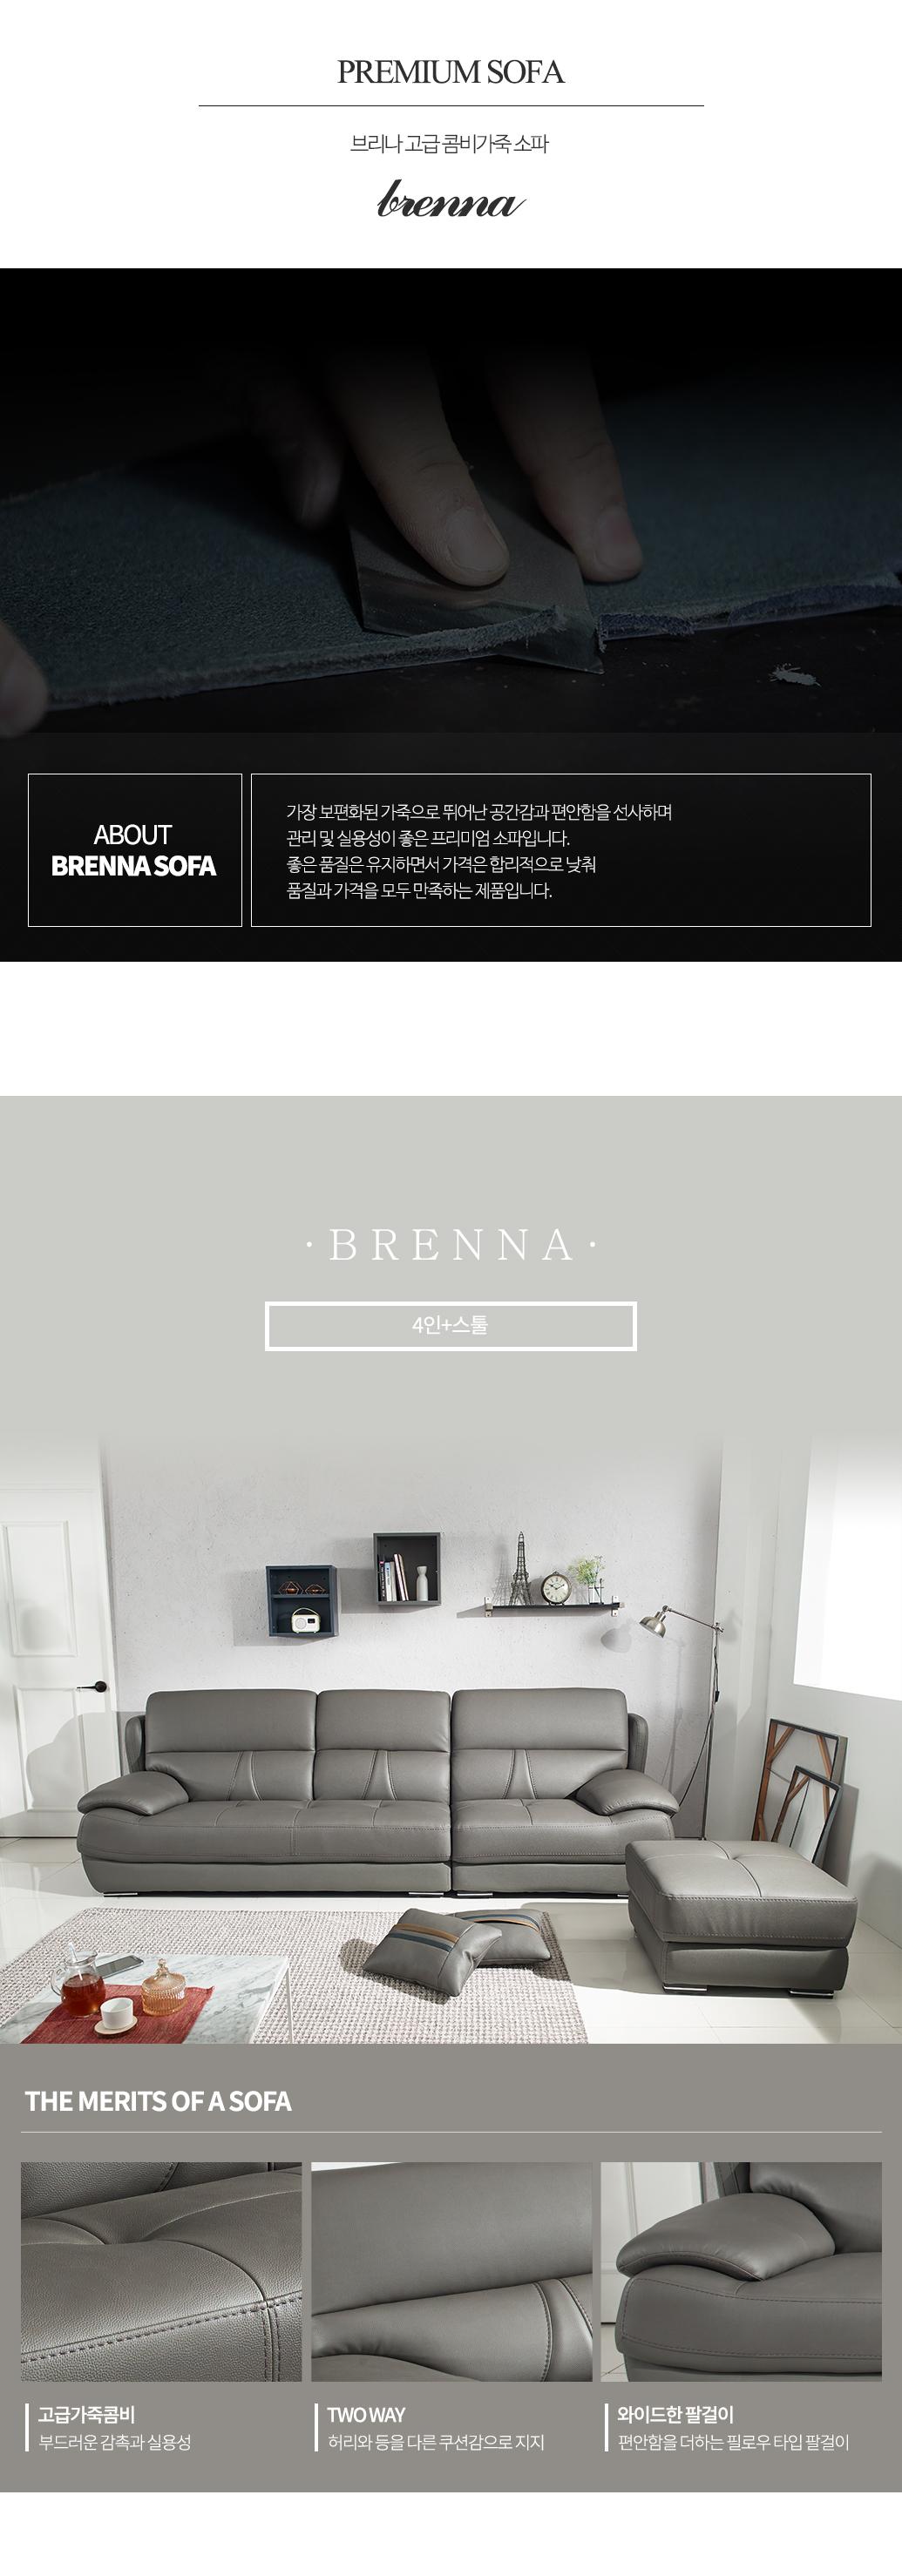 brenna01.jpg